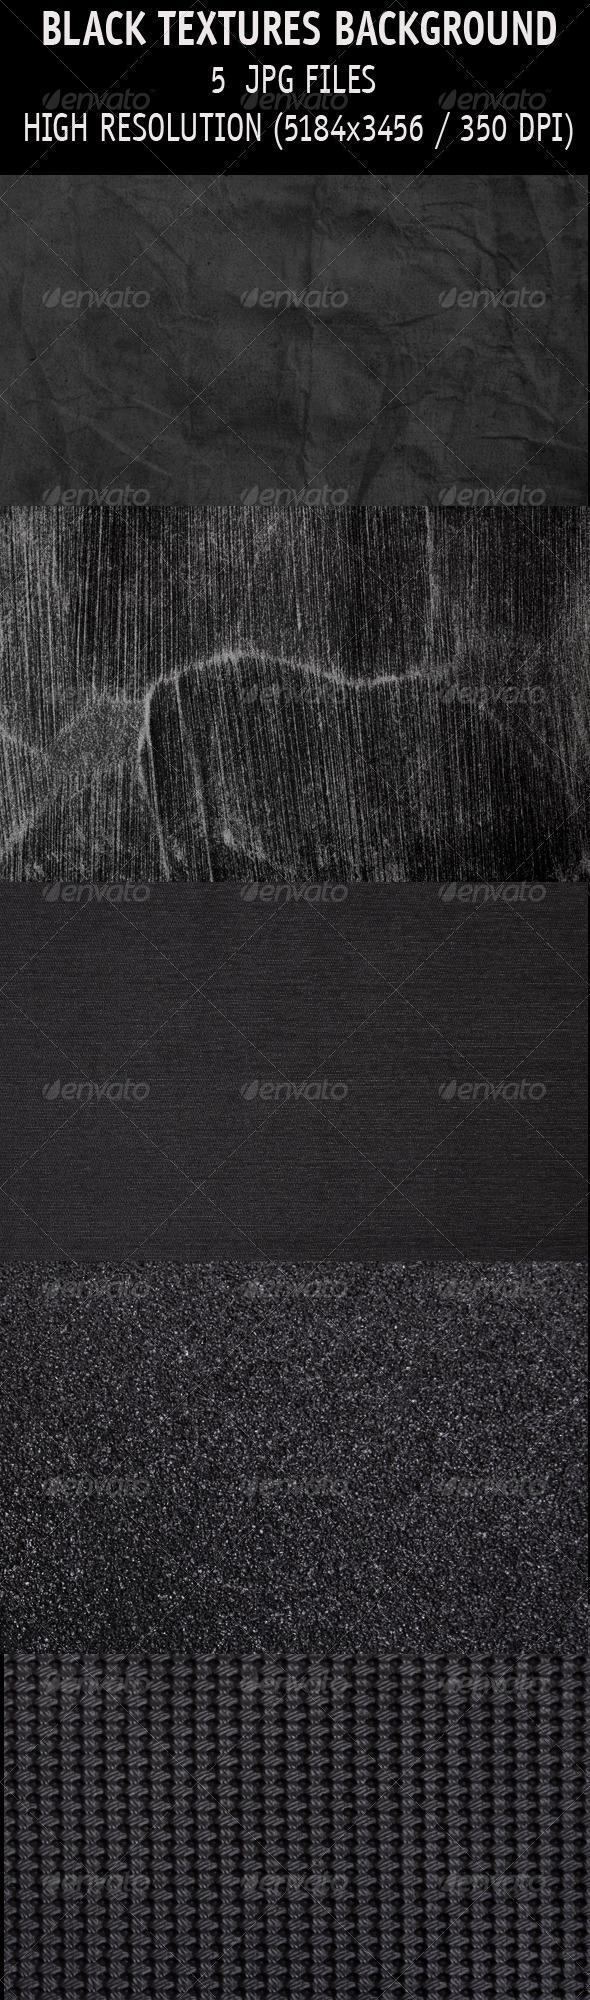 Black textures background